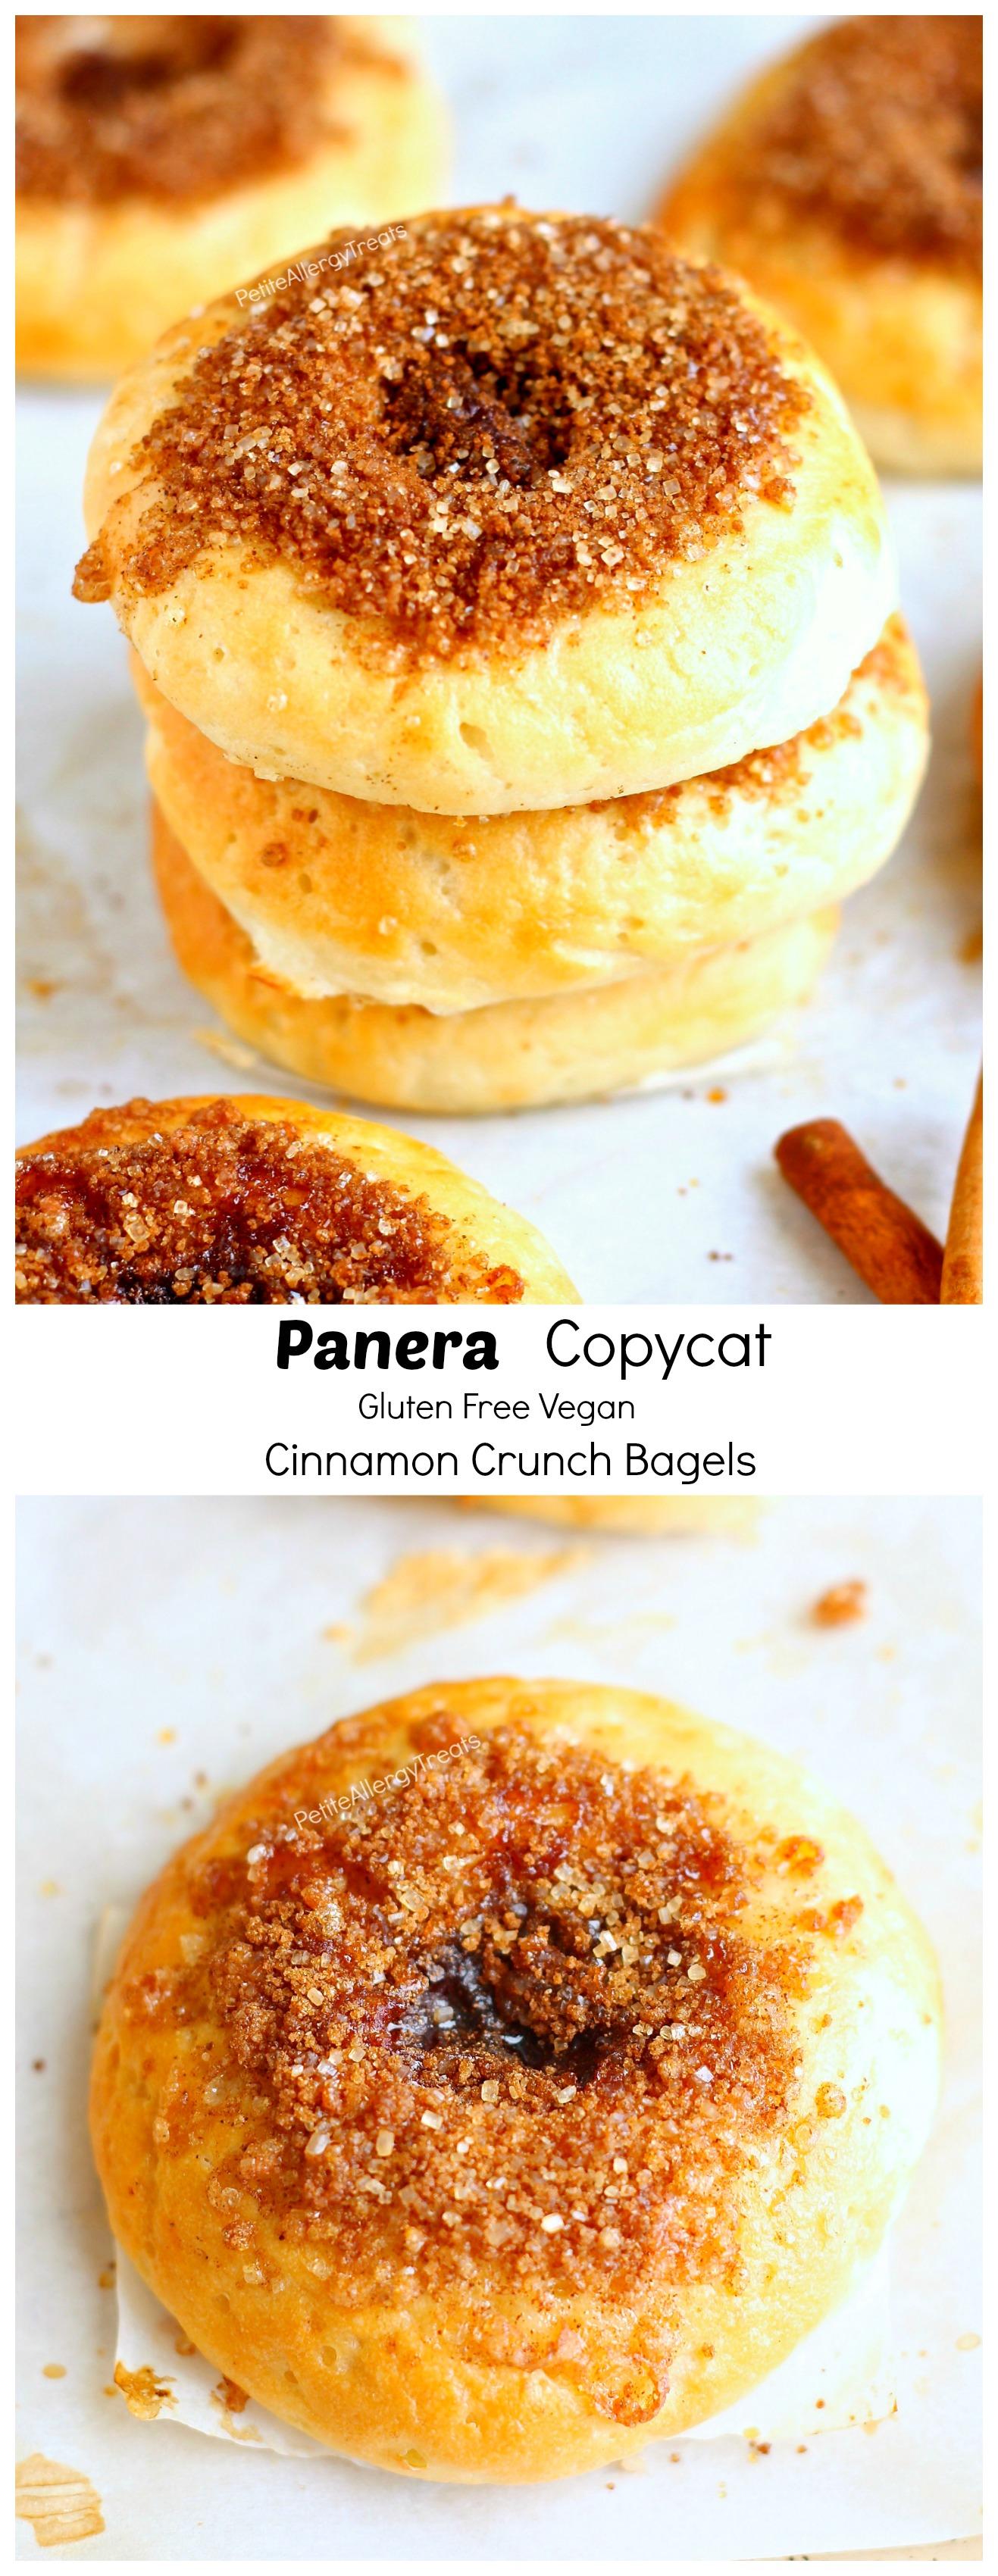 Gluten Free Copycat Cinnamon Crunch Panera Bagels ( Vegan) - Crunchy Panera cinnamon crunch bagels turned gluten free egg free and vegan! You can now enjoy bagels again